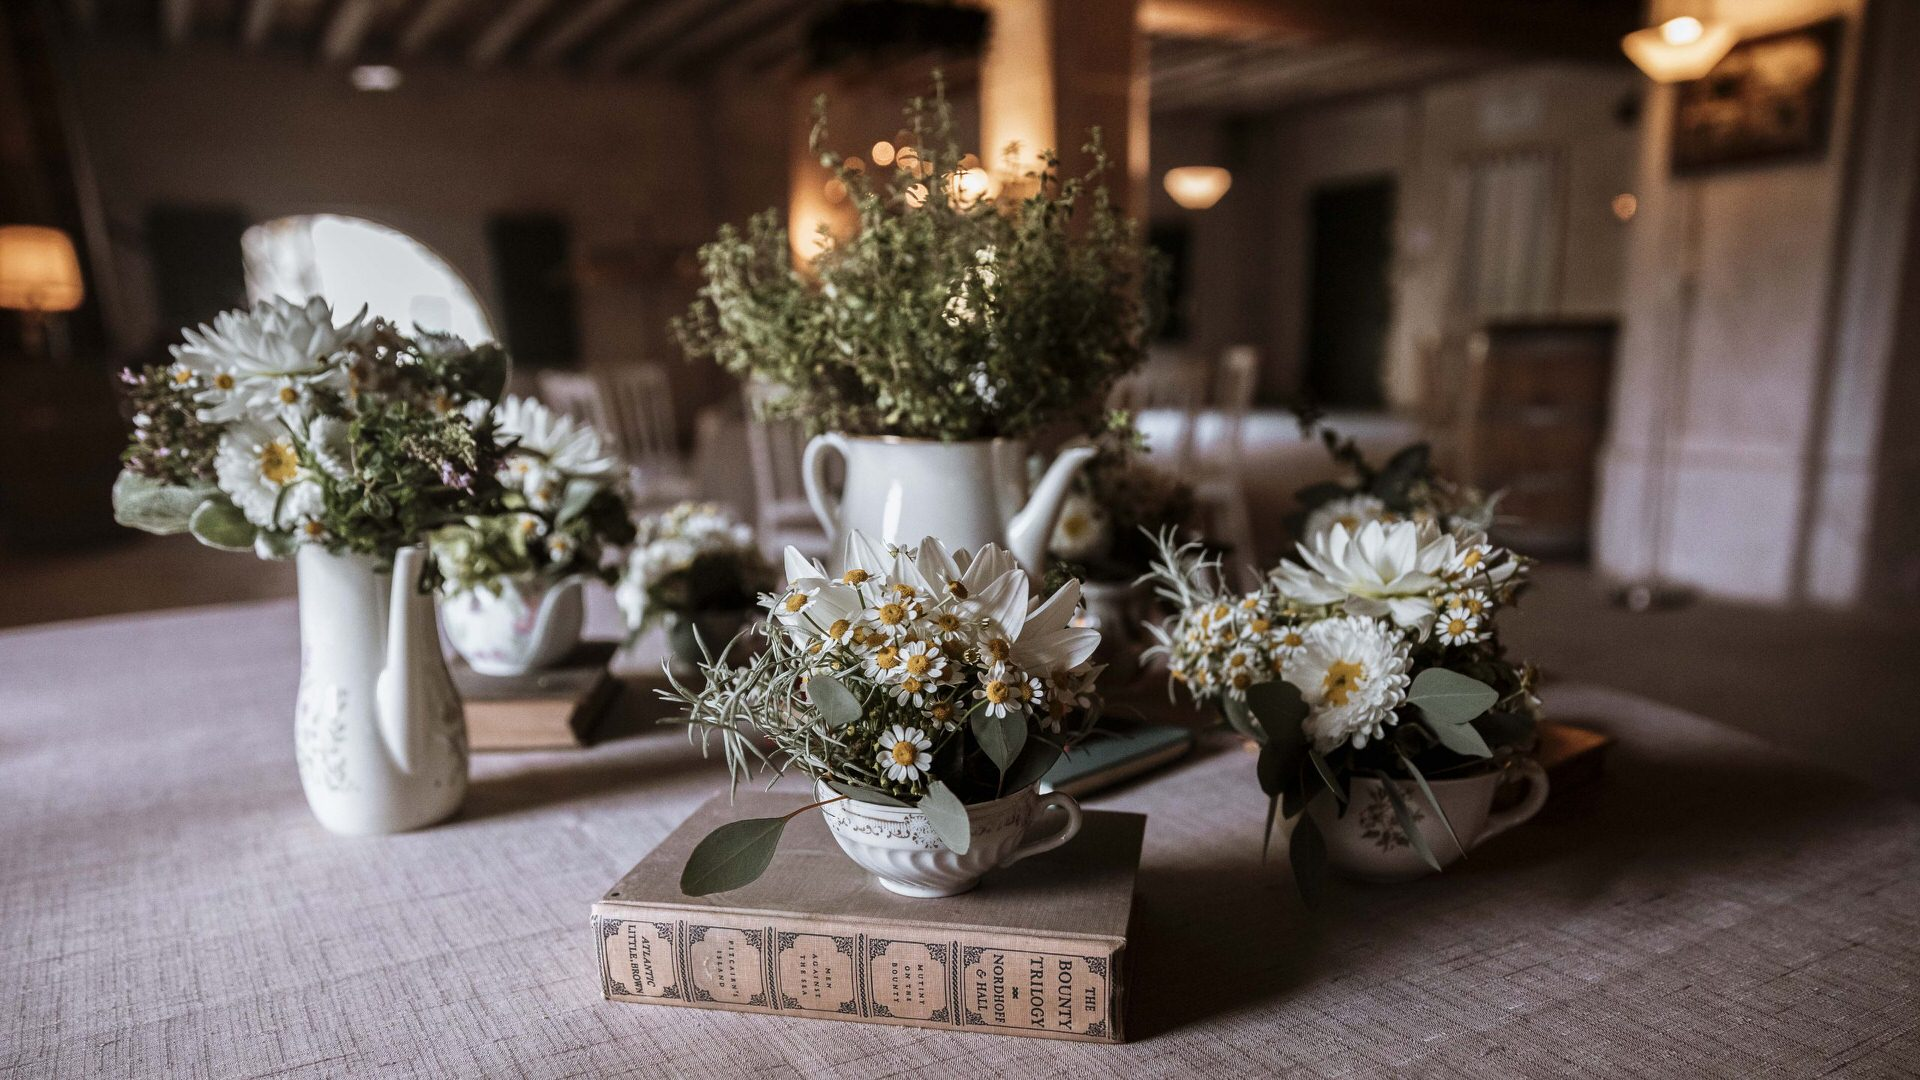 fotografo matrimonio pordenone villa brandolini vistorta gap eventi sacile